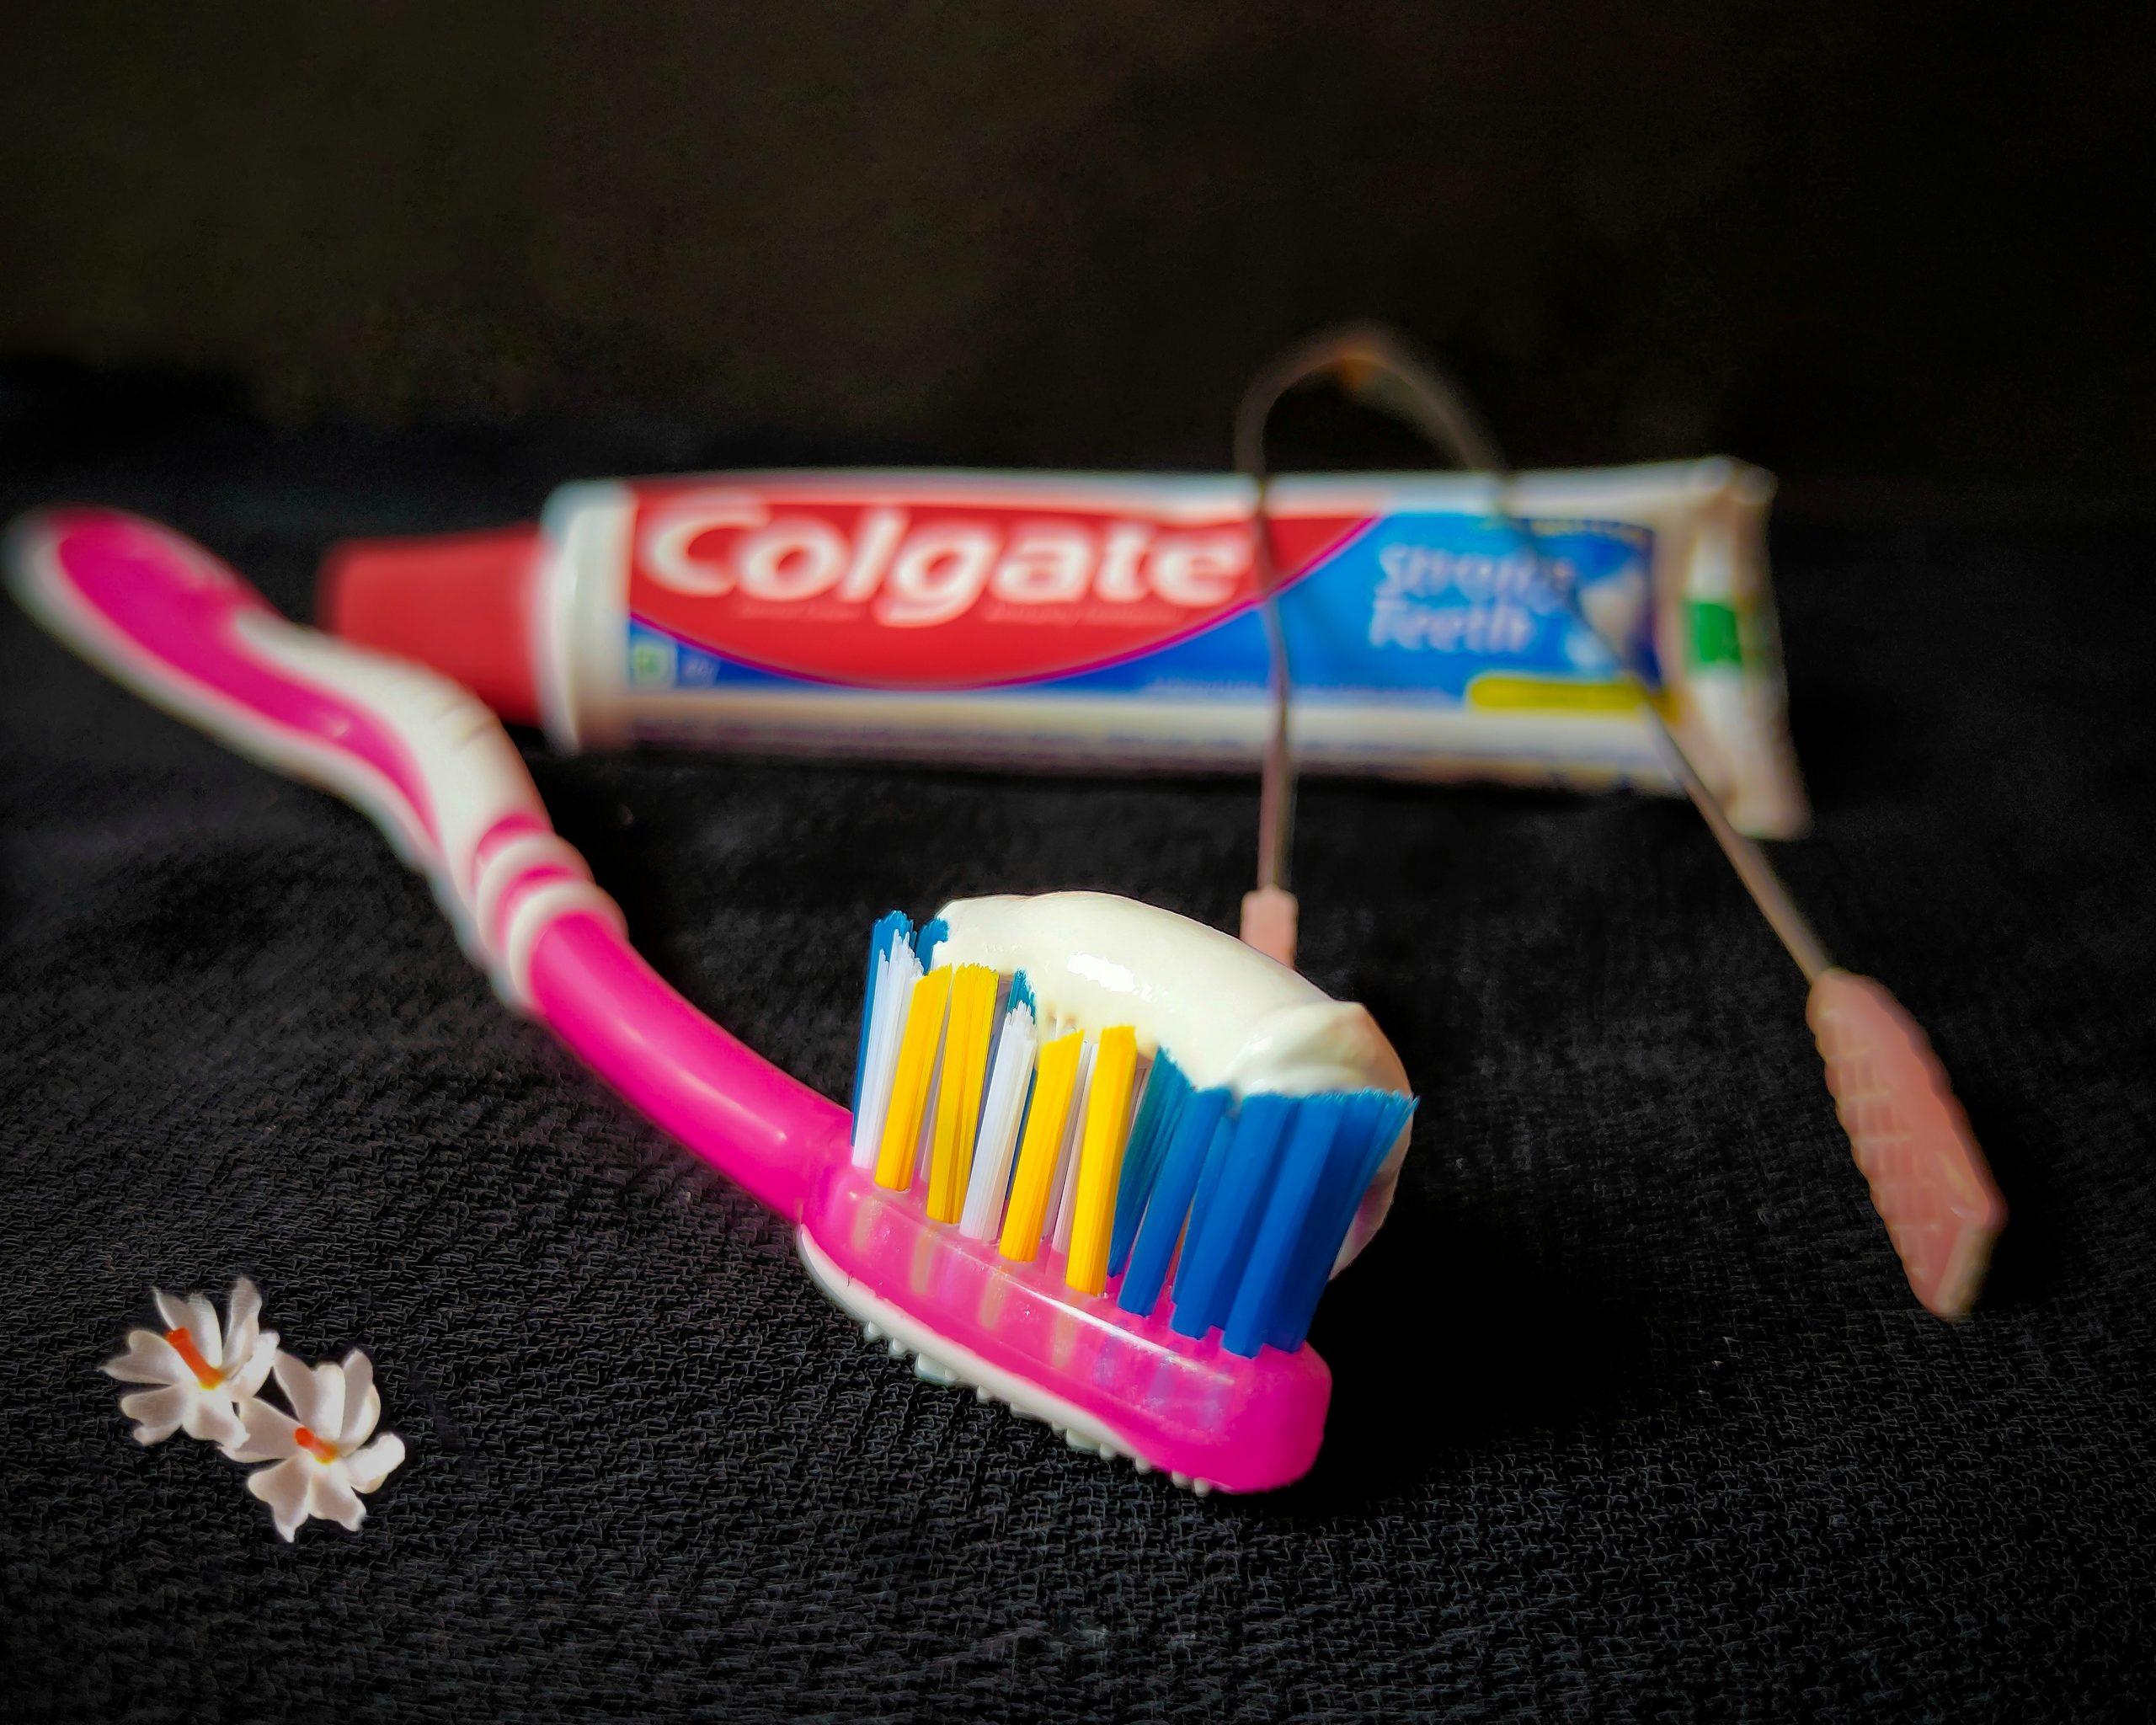 Oral health items